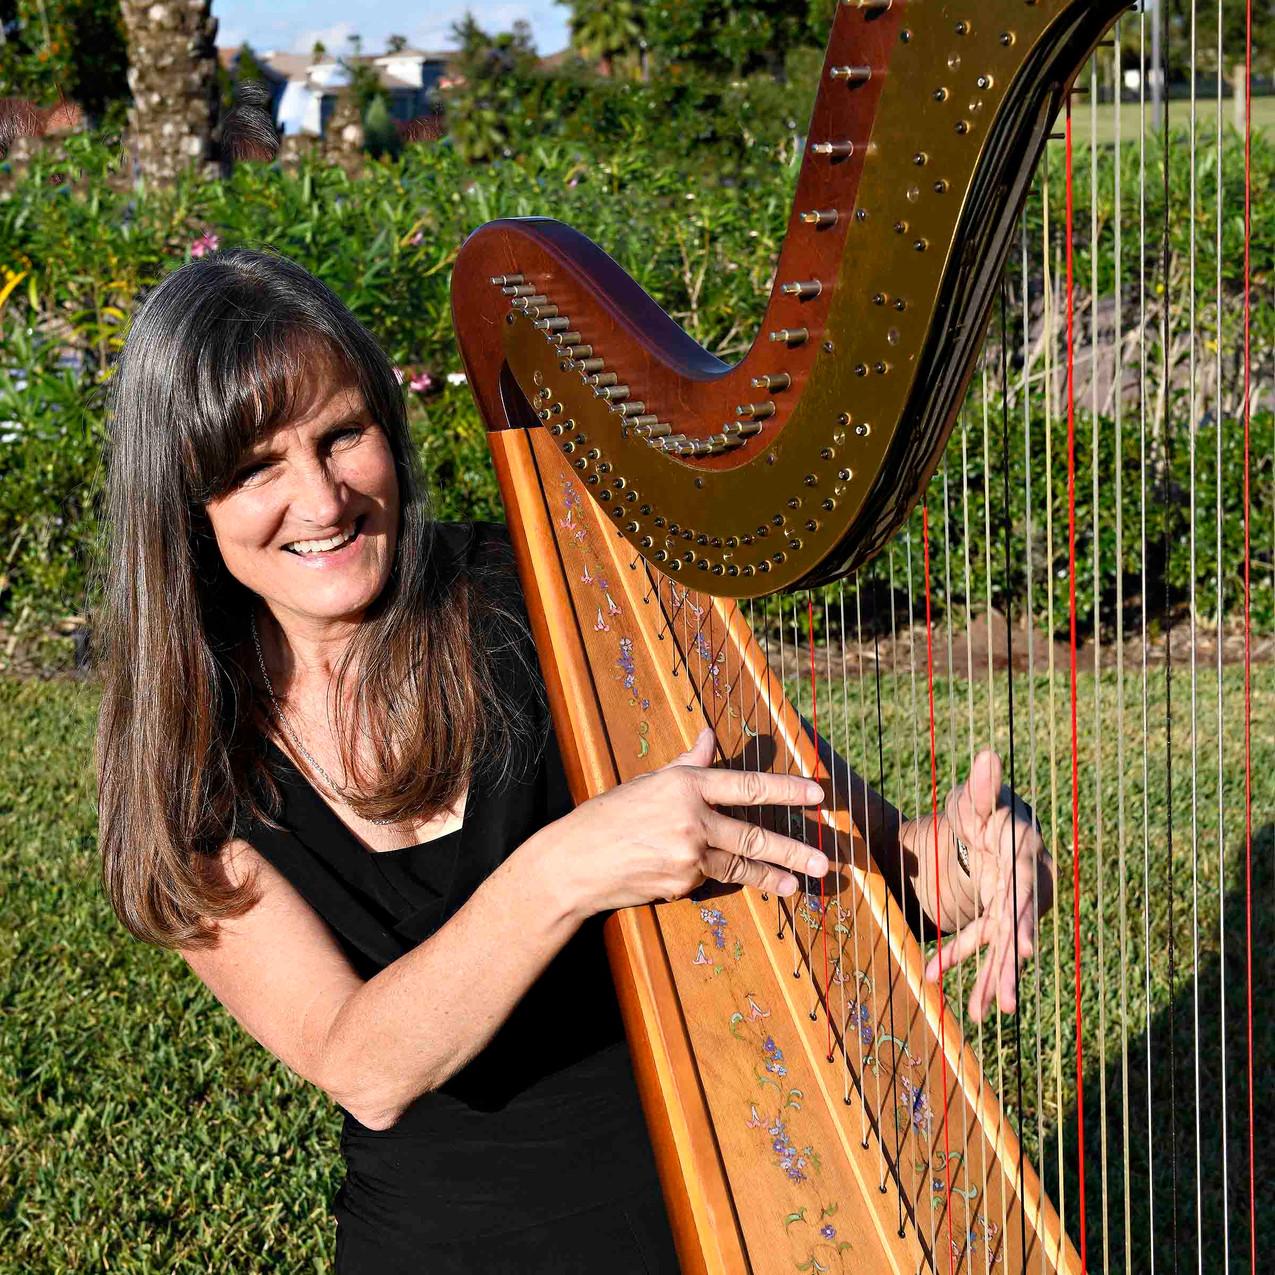 Beautiful harpist!